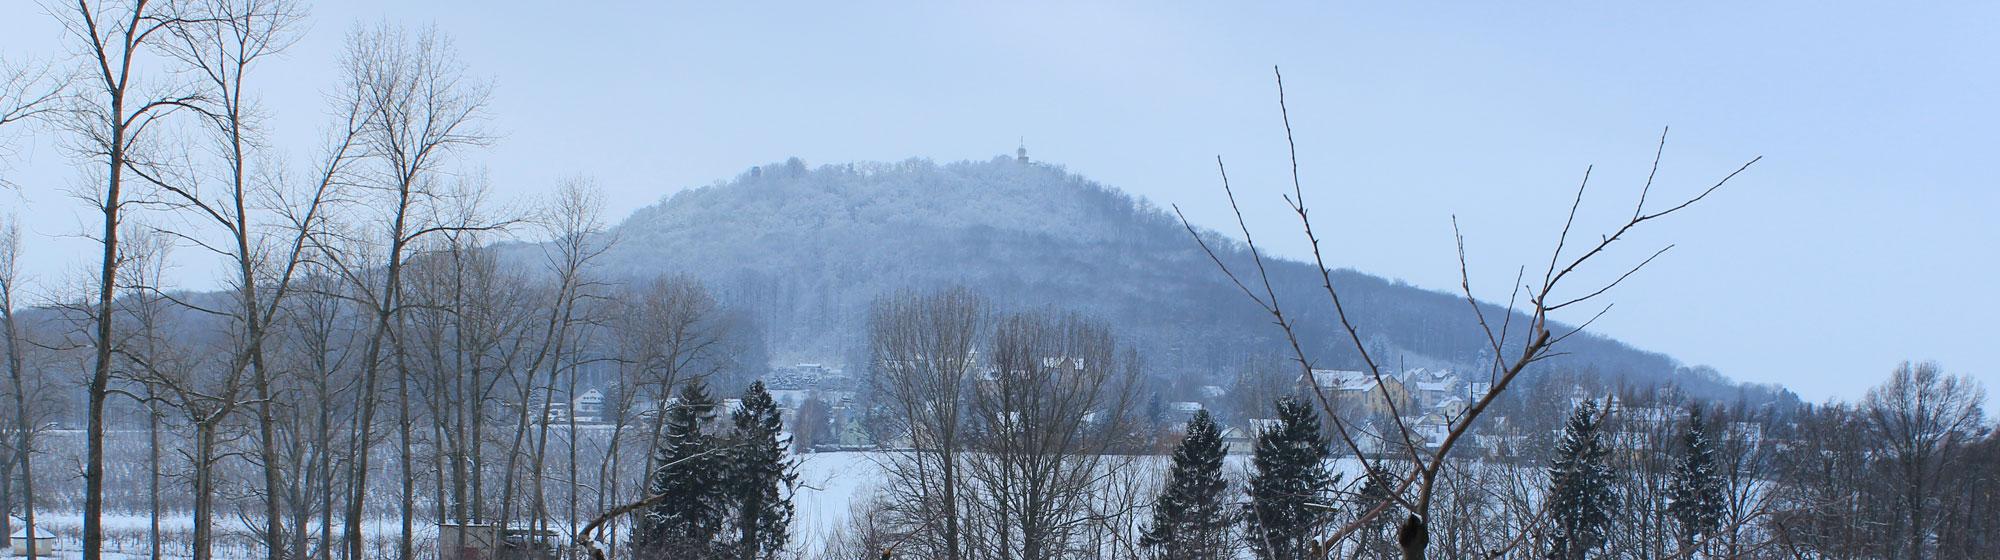 Stadtgut Görlitz Winter-Landeskrone.jpg